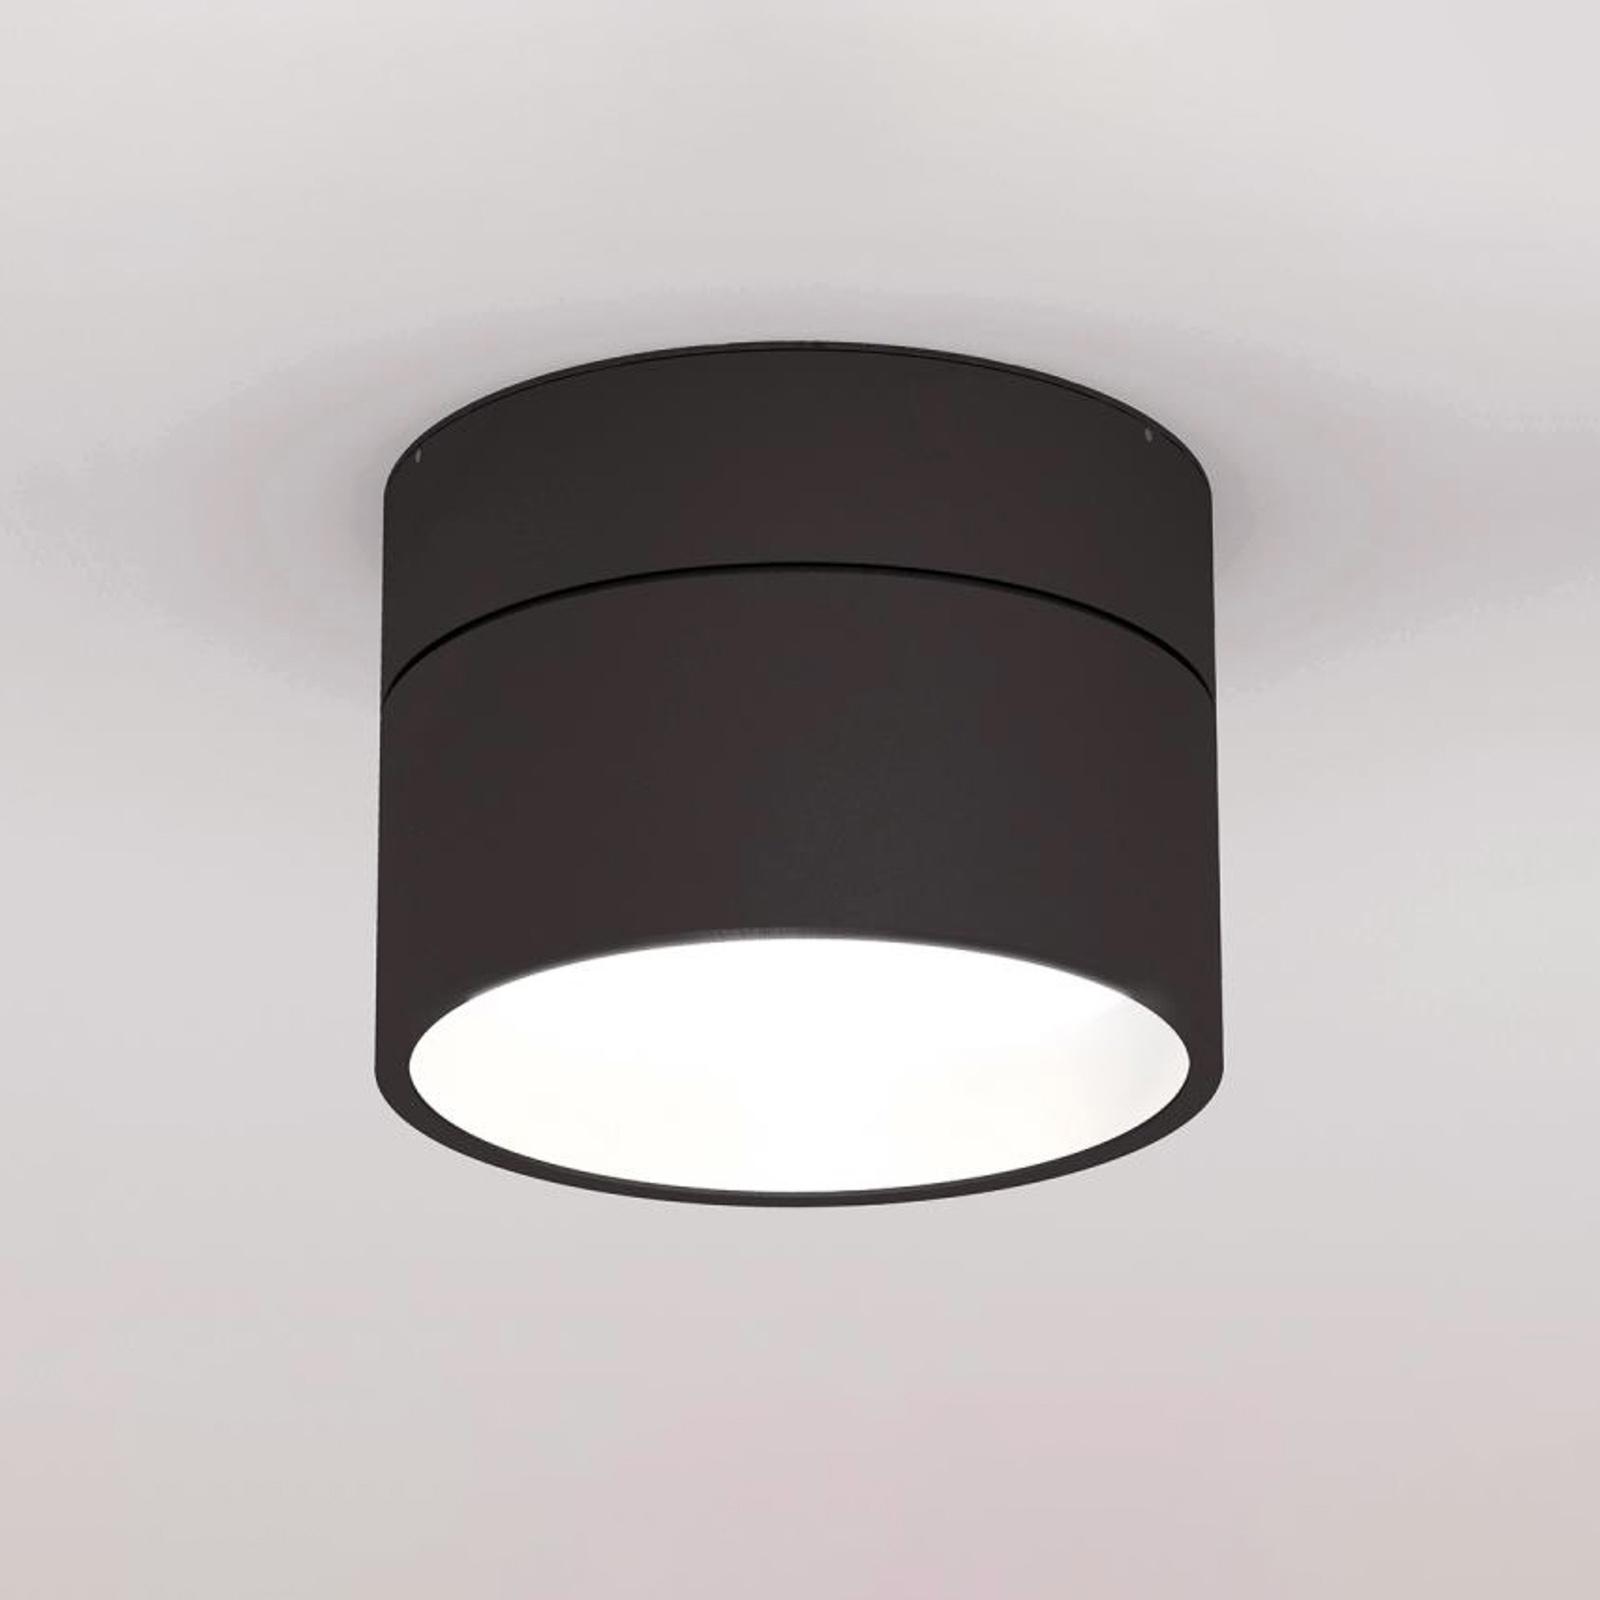 LOUM Turn on LED-loftlampe, 2.700 K, sort/hvid